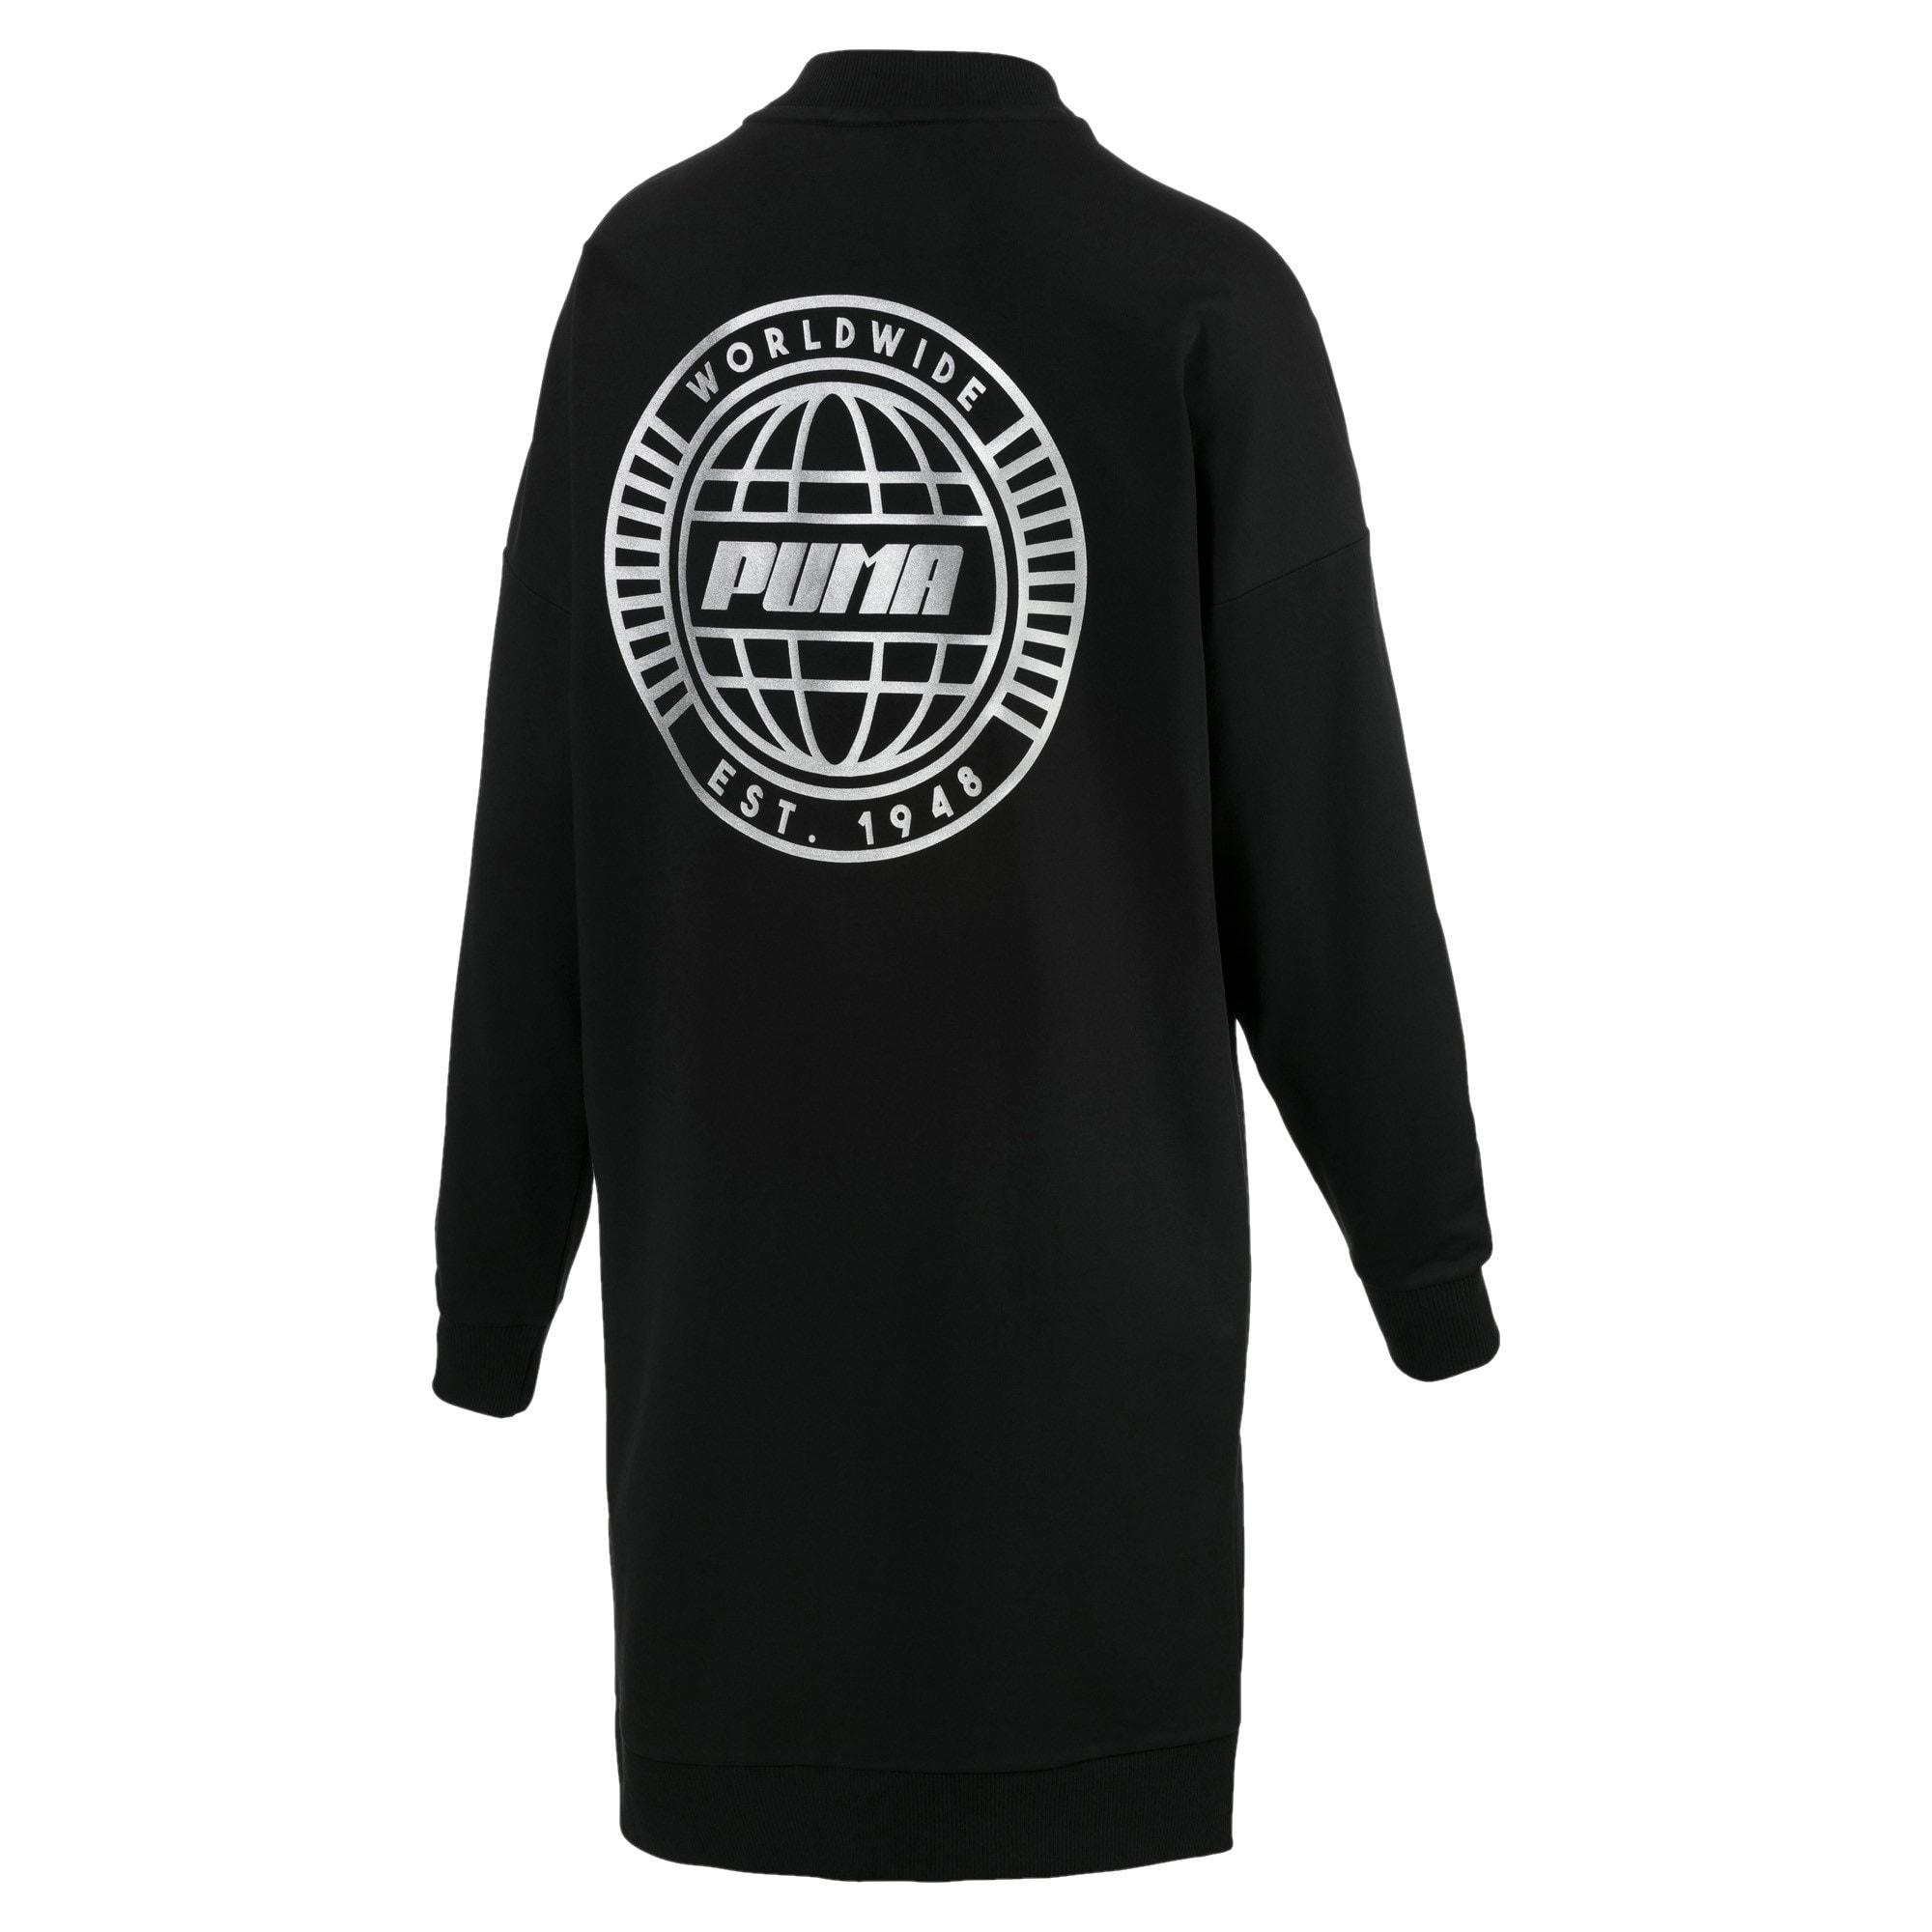 Thumbnail 5 of Trailblazer Women's Long Crewneck Sweatshirt, Cotton Black, medium